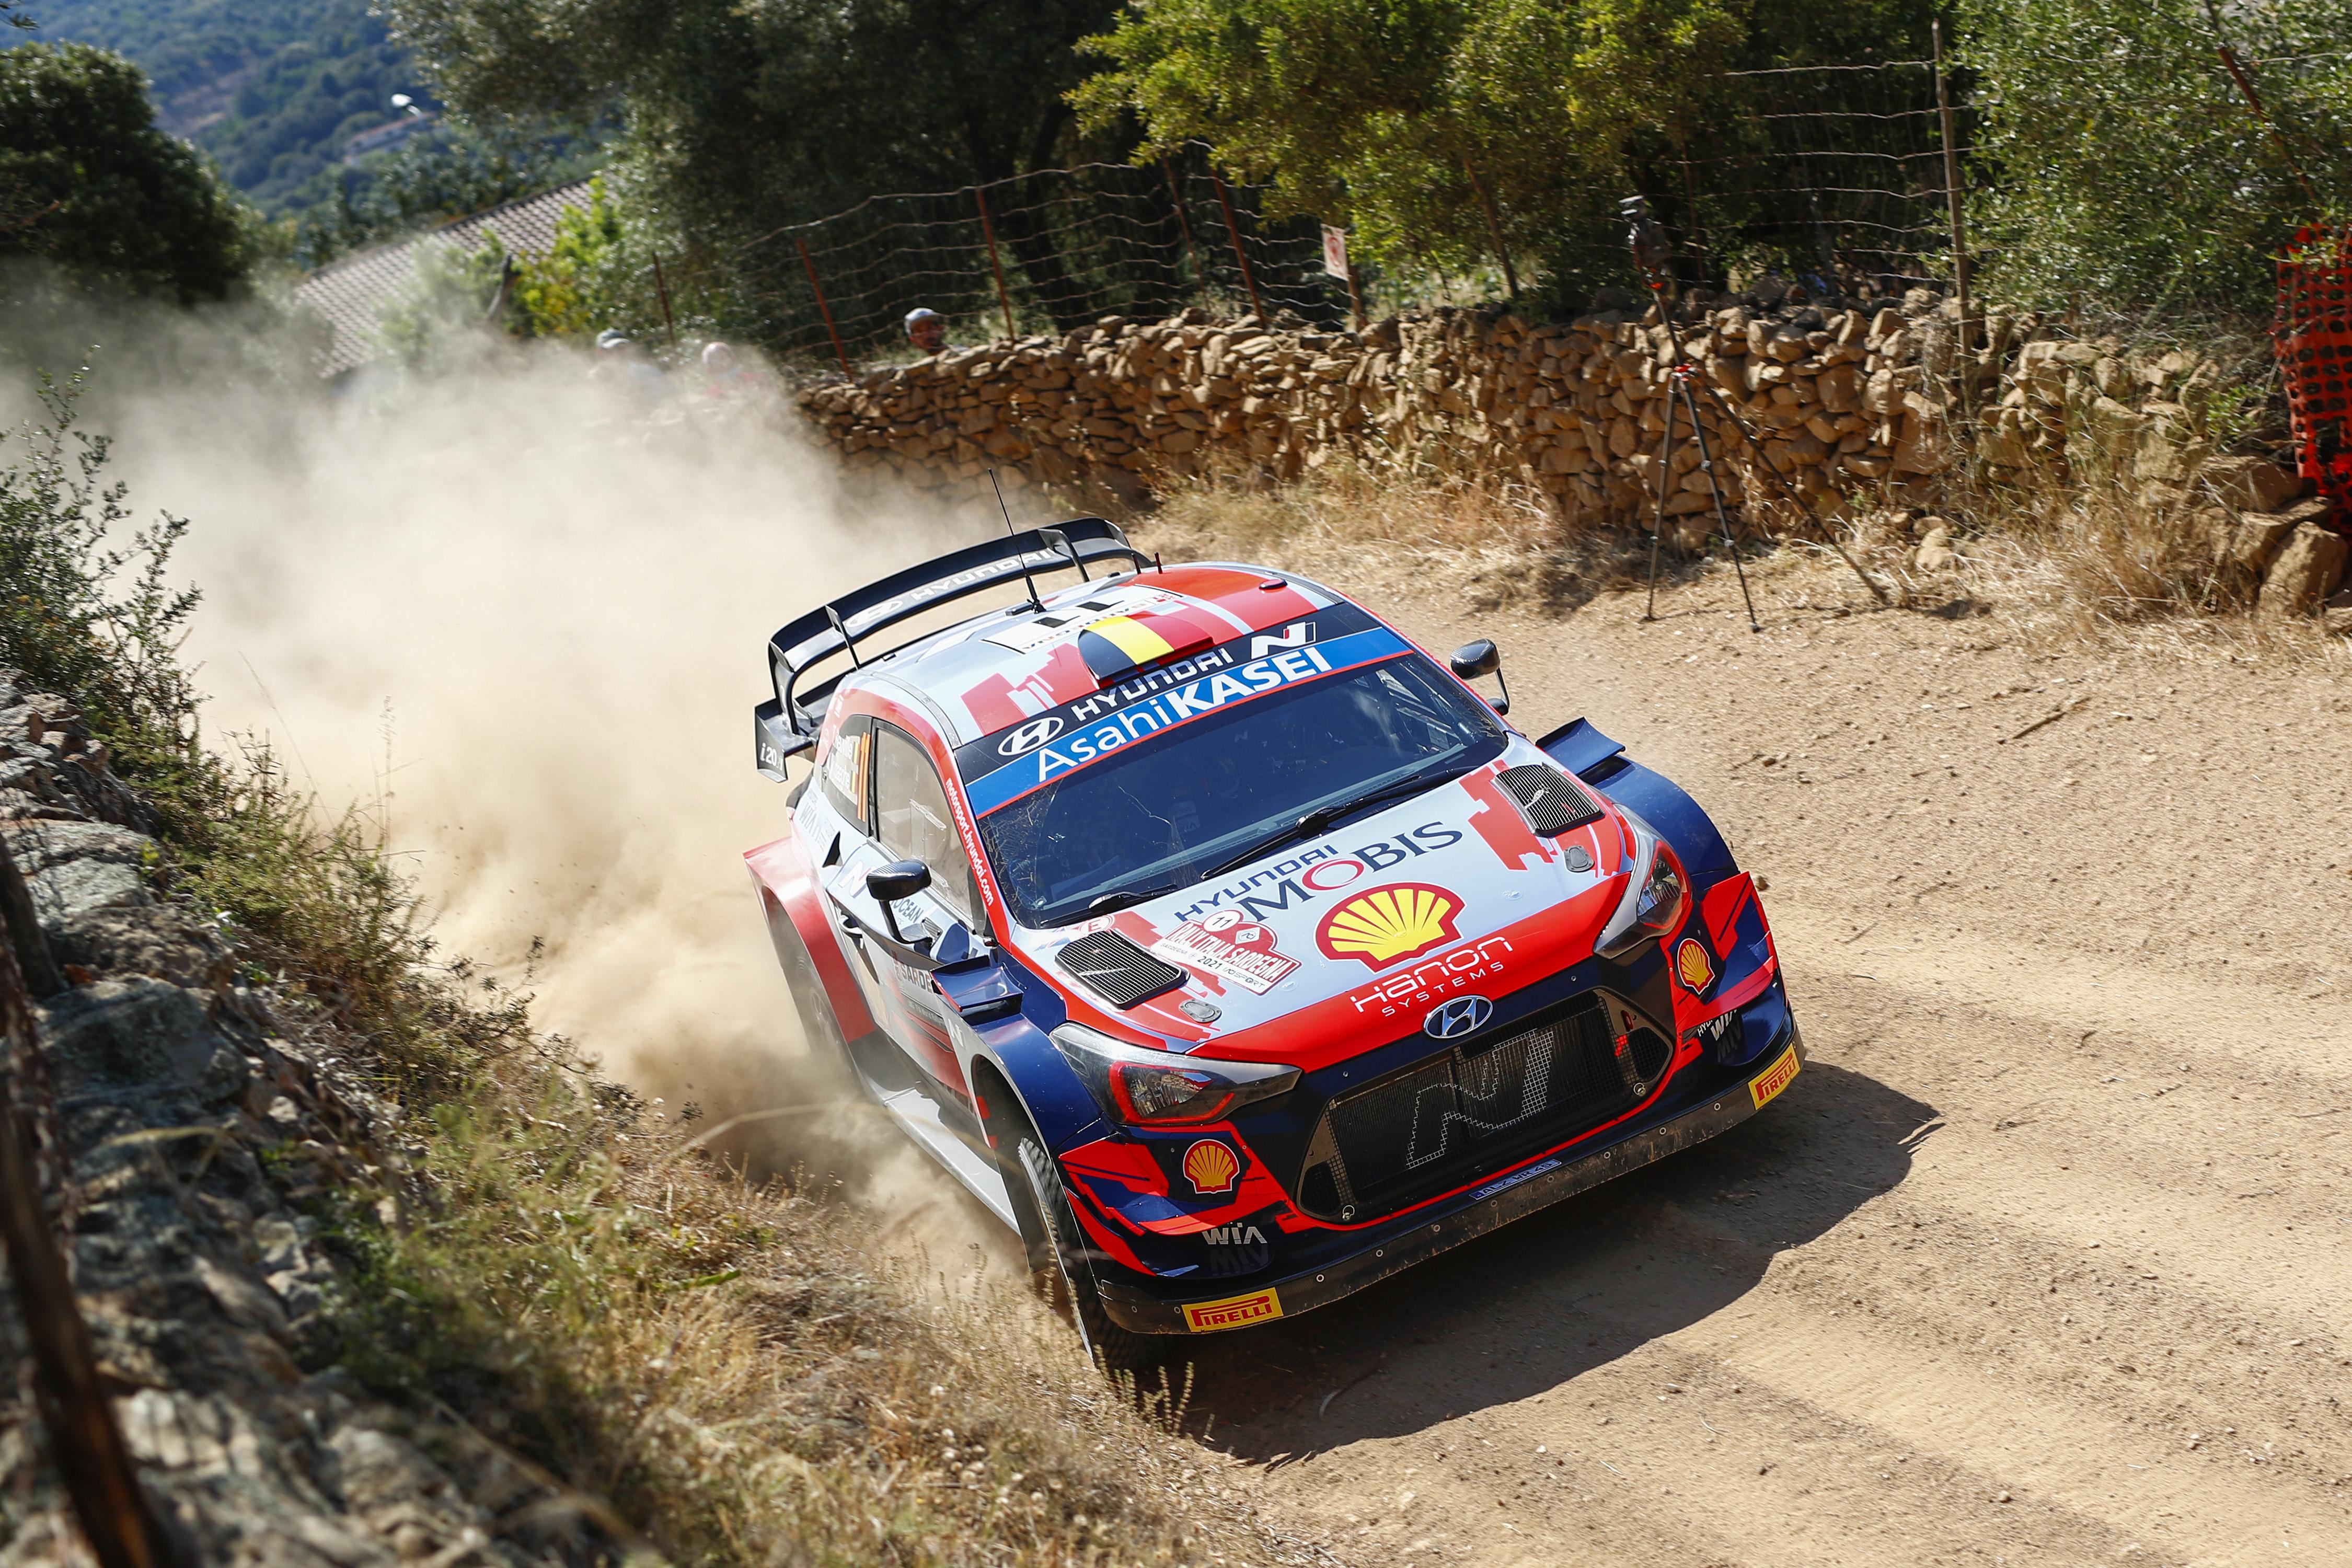 WRC: Rally d'Italia - Sardegna [3-6 Junio] - Página 2 030621_Neuville_SD